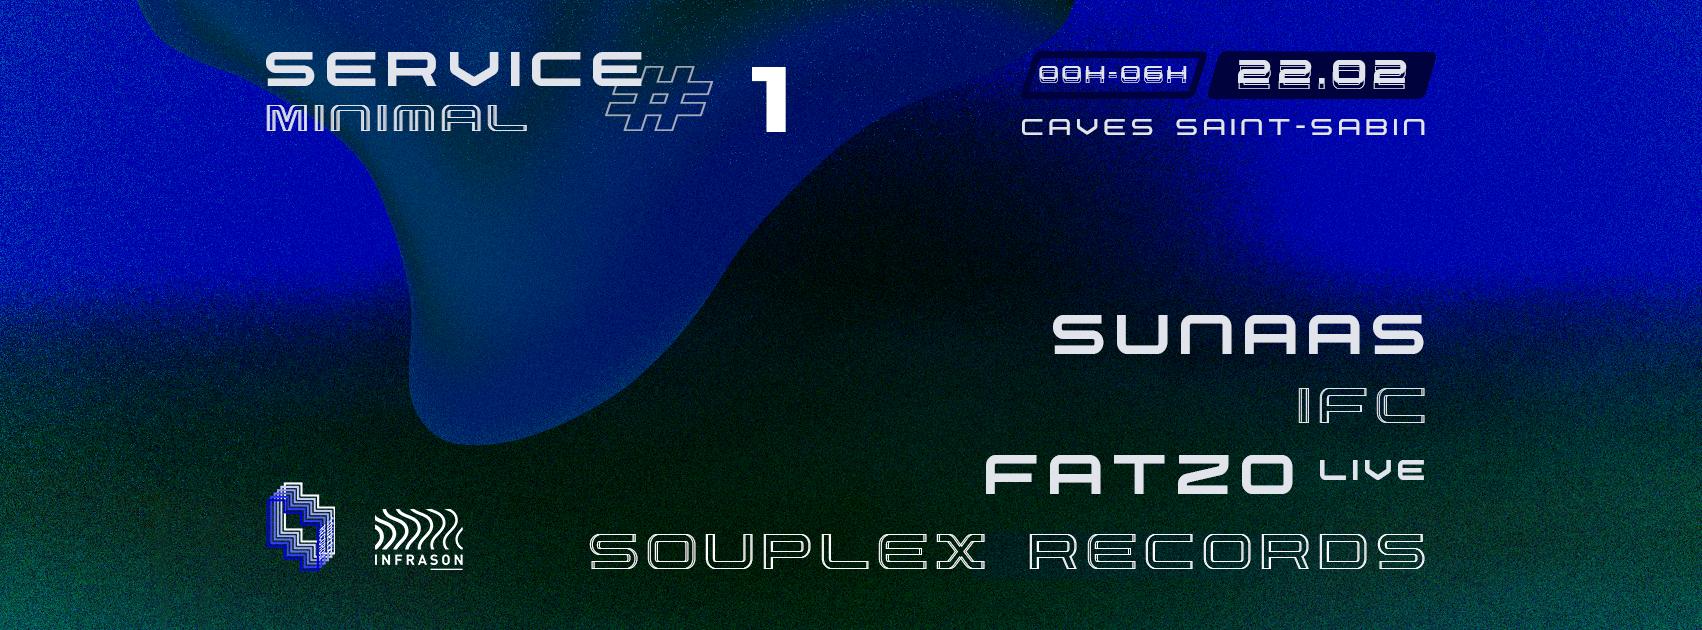 Service Minimal #1 // Fatzo ◆ Sunaas ◆ Souplex Records ◆ Infrason Fantastic Crew